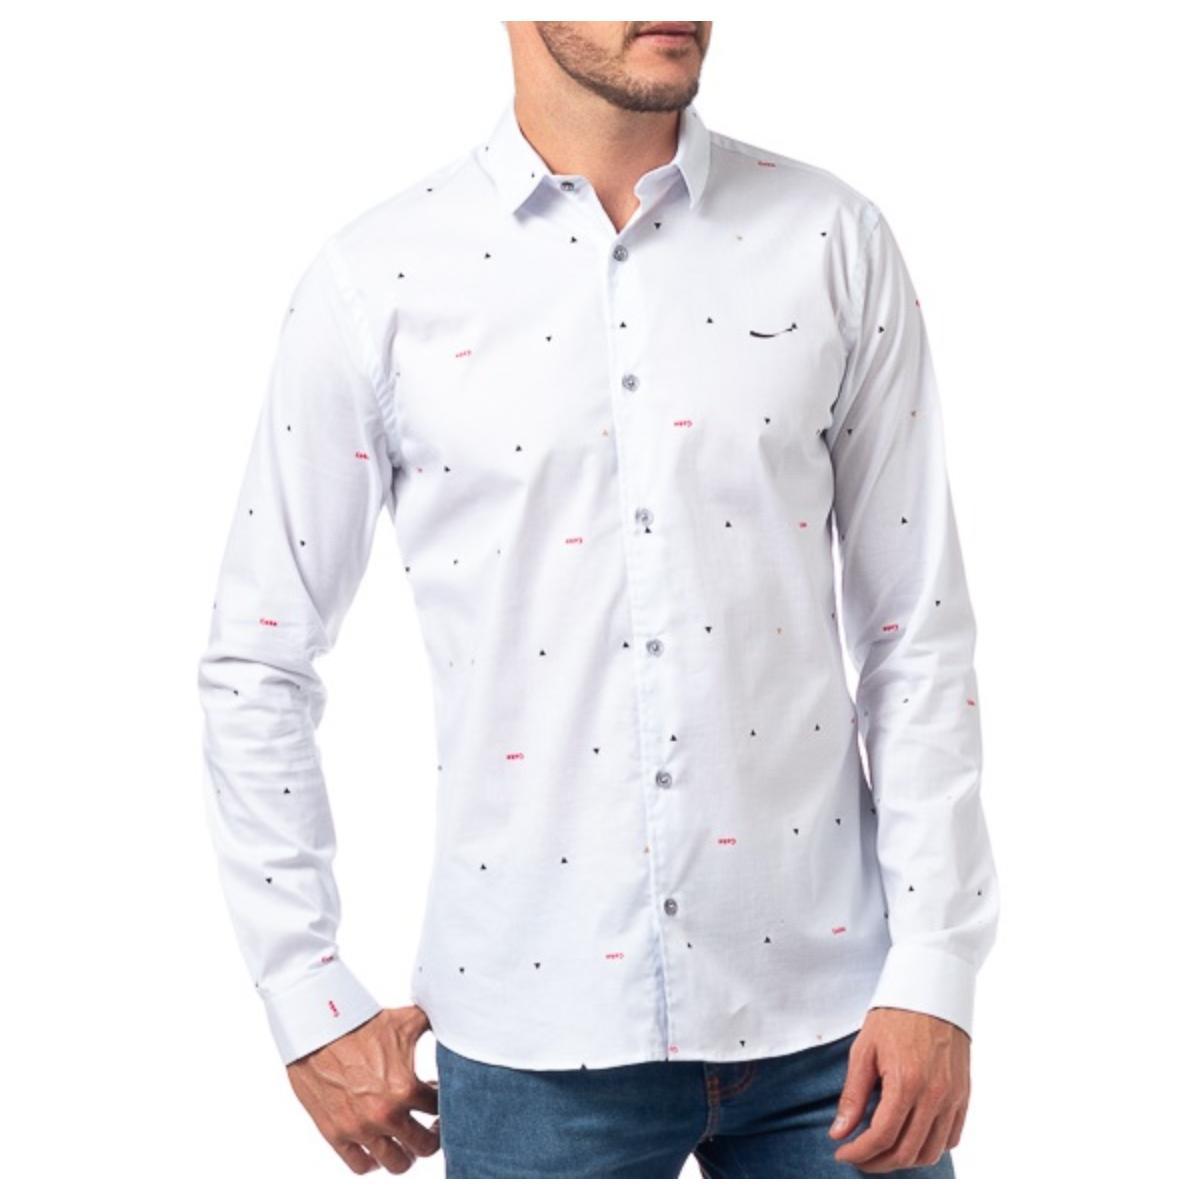 Camisa Masculina Coca-cola Clothing 313201038 Vc259 Off White Estampado